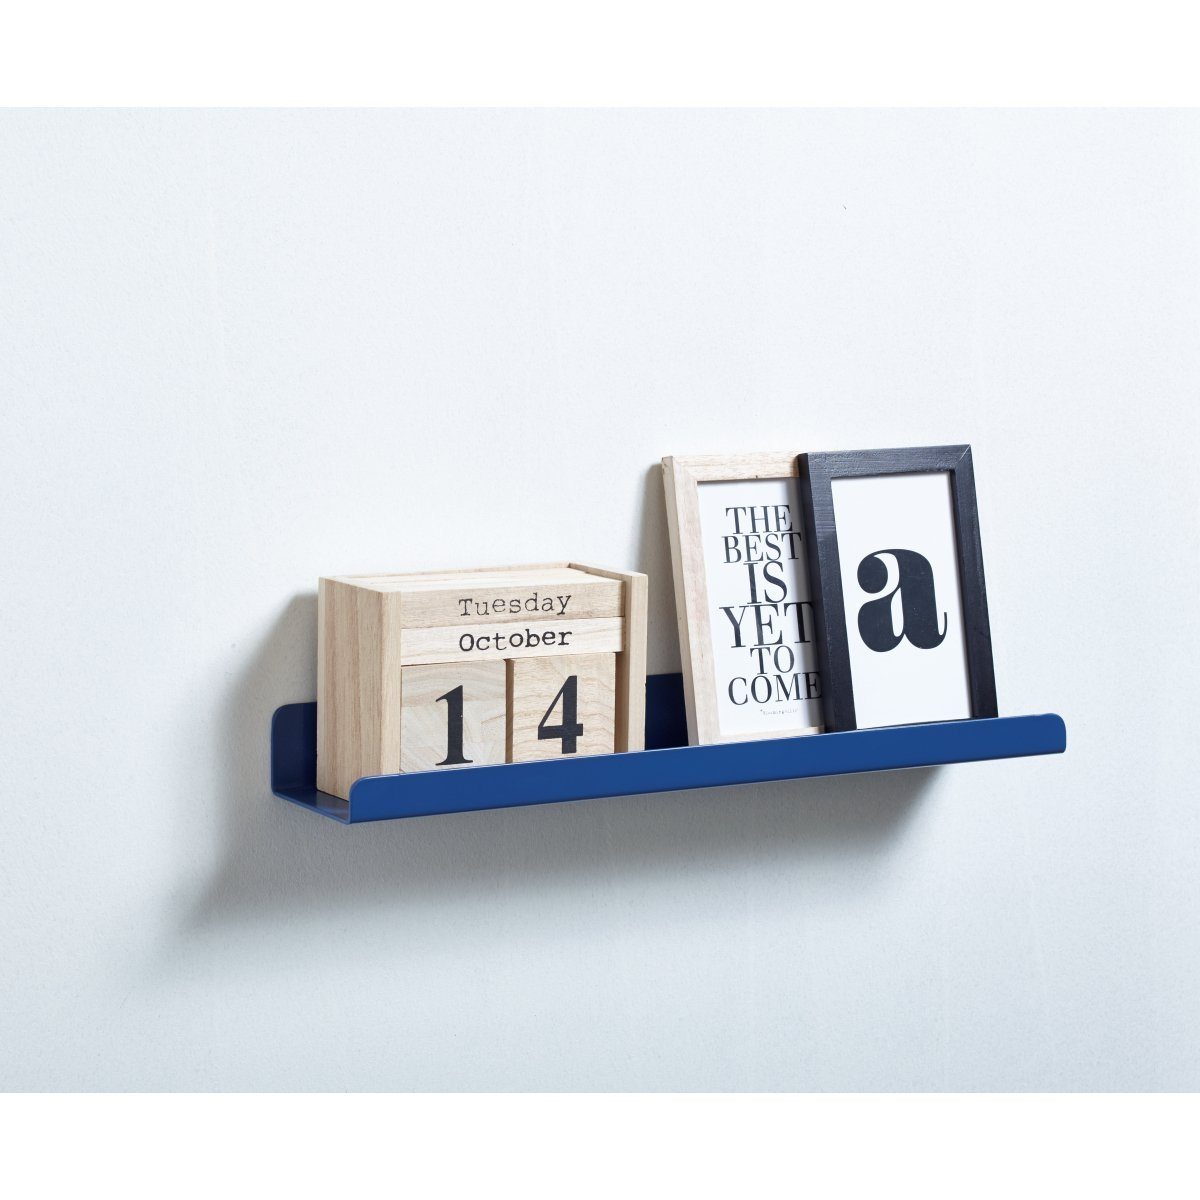 flexa classic buchregal in blau 82 80159 31. Black Bedroom Furniture Sets. Home Design Ideas